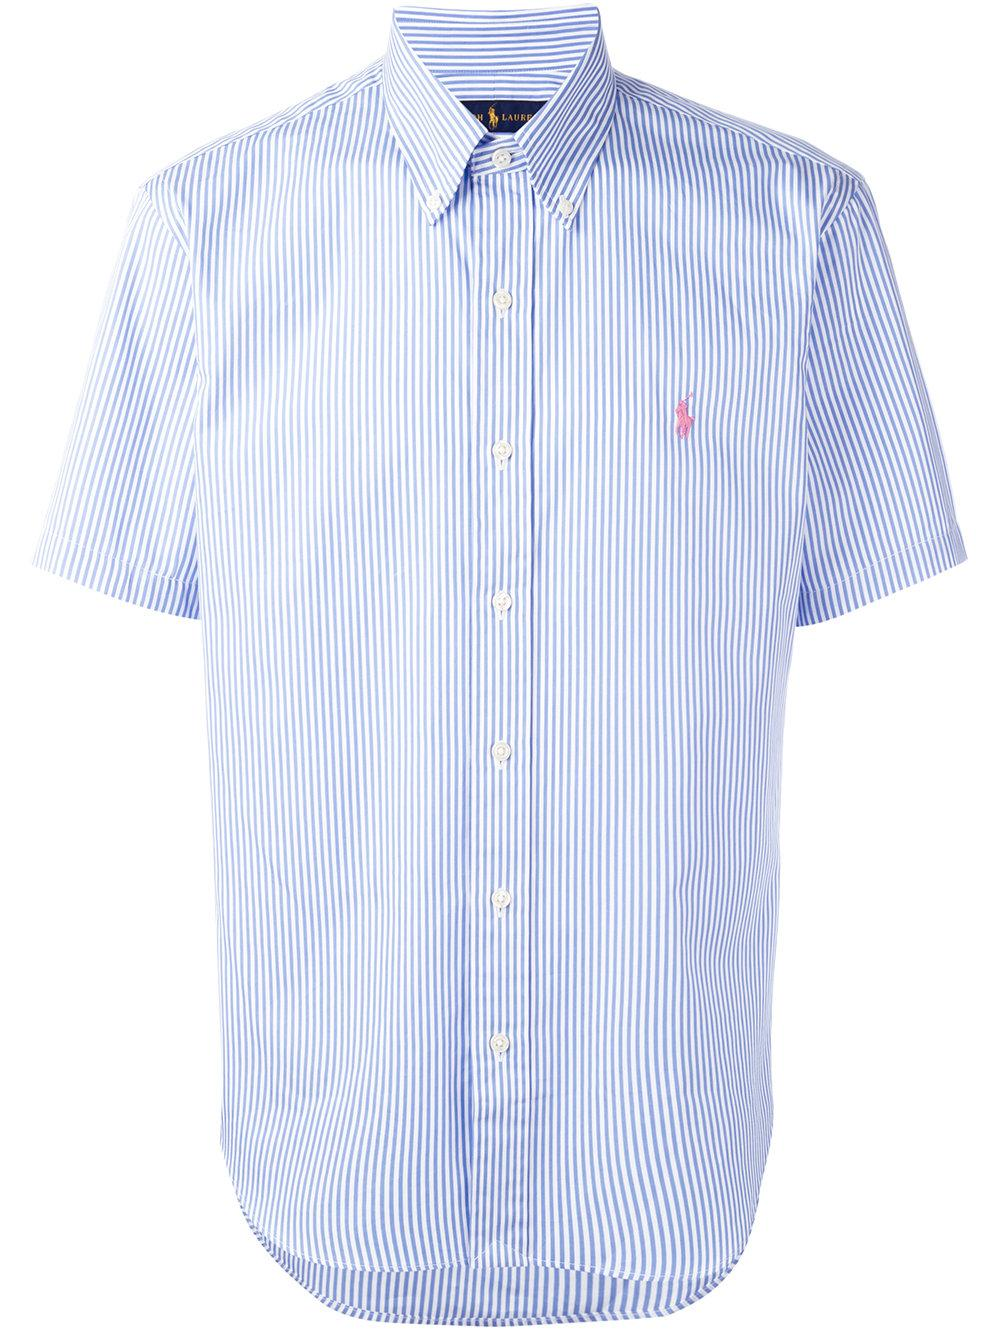 Lyst Polo Ralph Lauren Striped Short Sleeve Shirt In